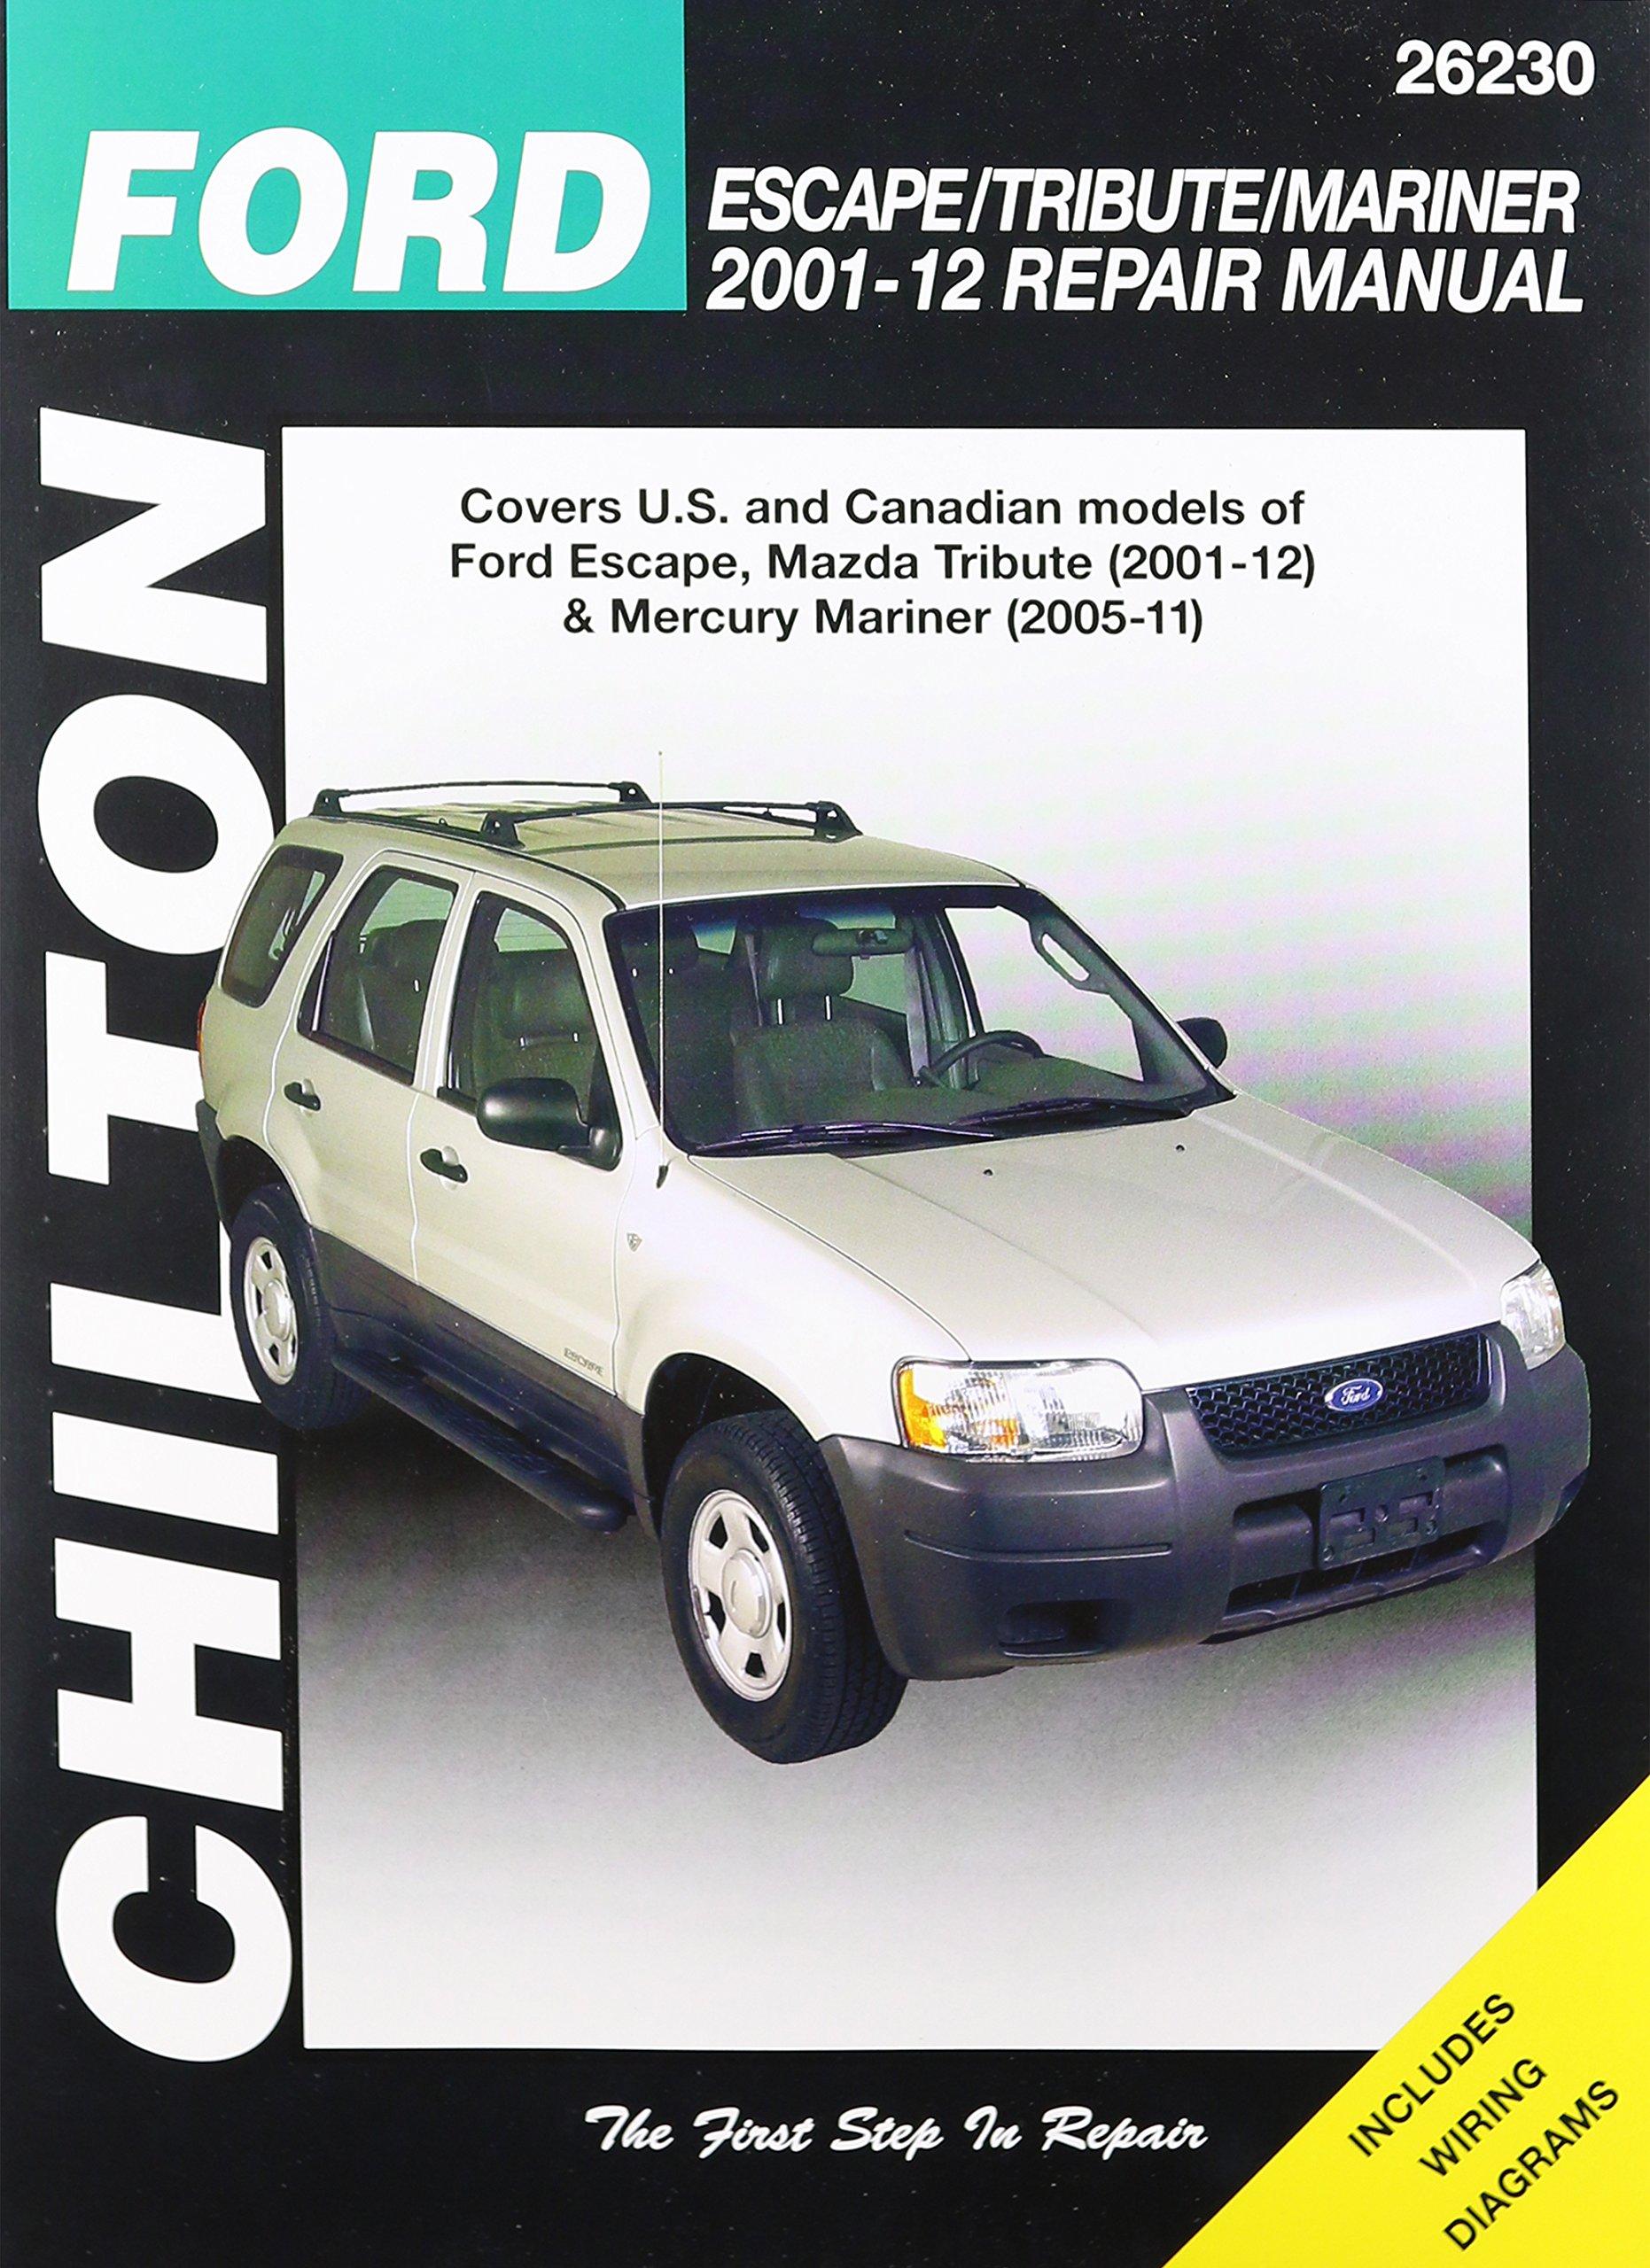 Chilton Total Car Care Ford Escape Tribute Mariner 2001 2012 Repair 2005 Mercury Wiring Diagram Manual 9781620920800 Books